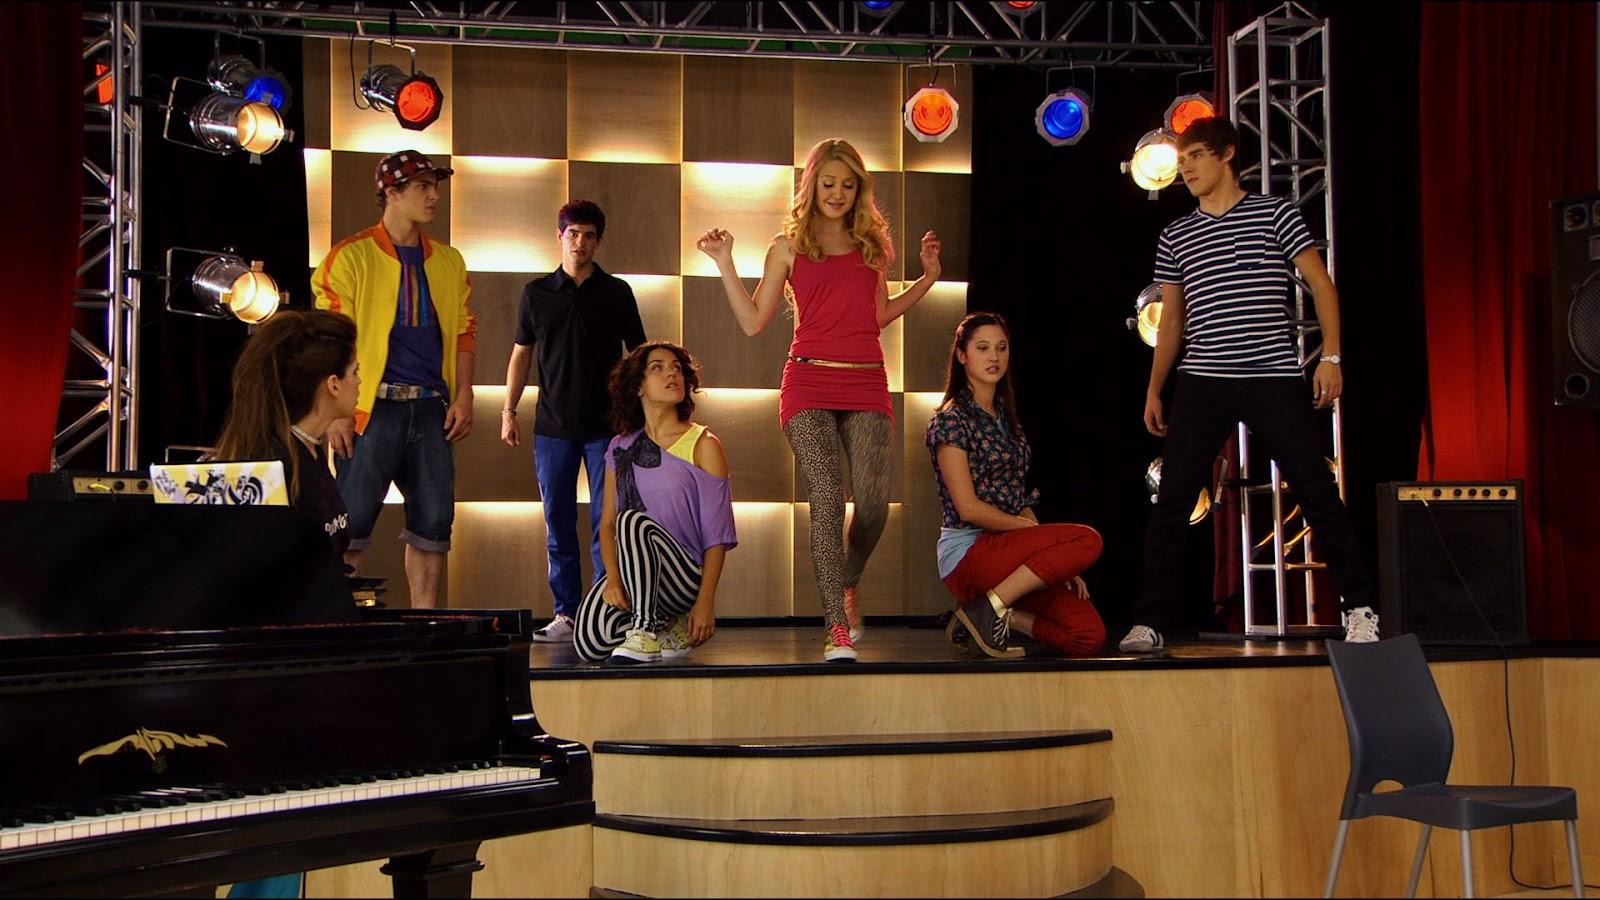 ♫ Violetta Disney Channel ♫ - lovevioletta.pinger.pl